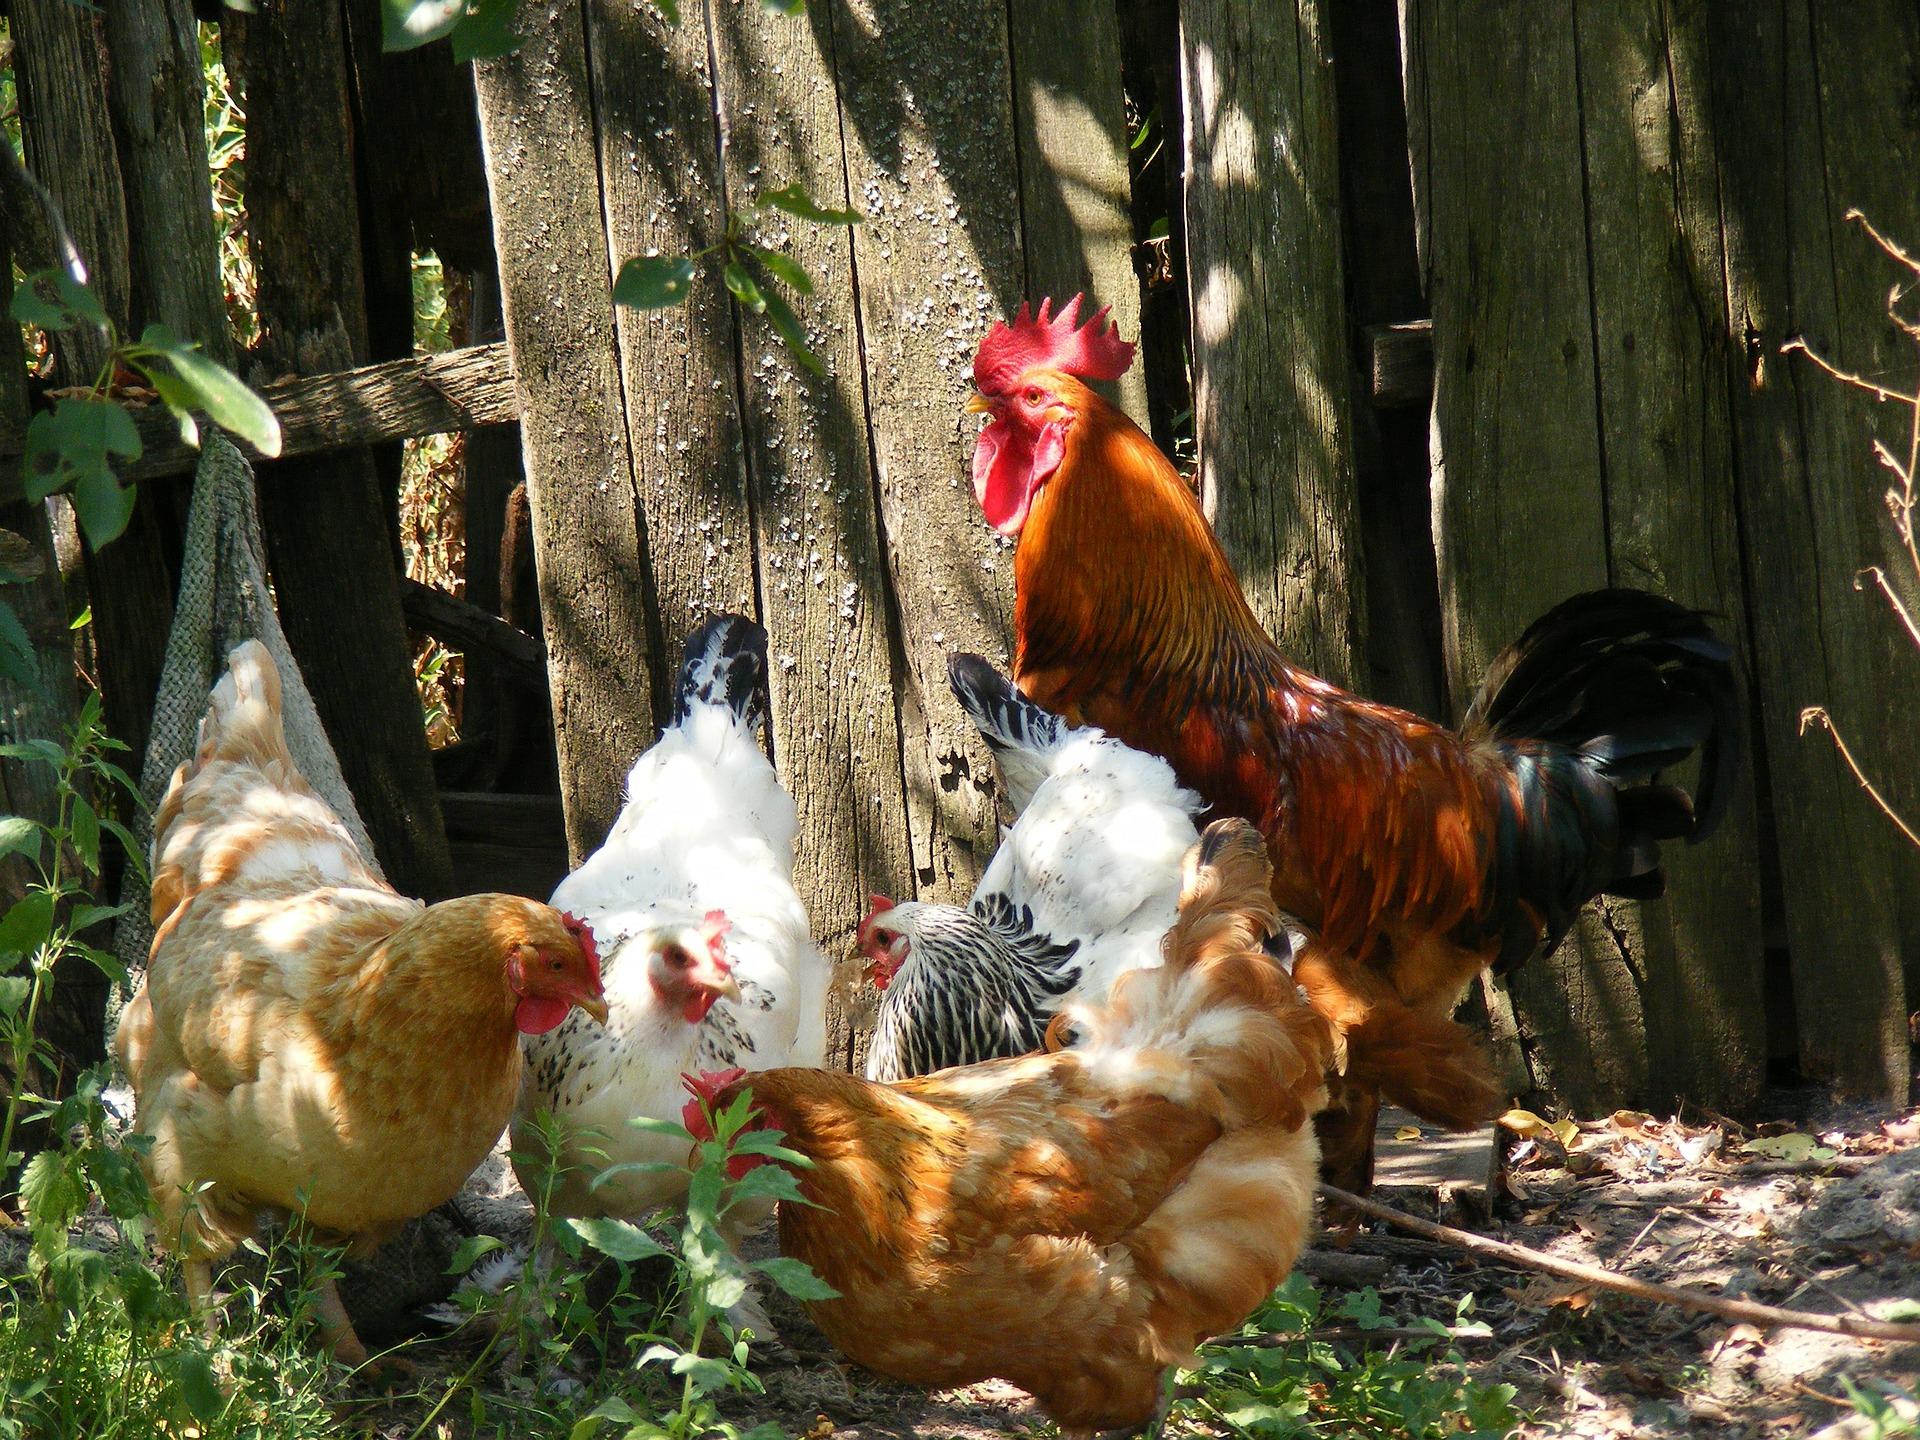 kippen houden Groningen